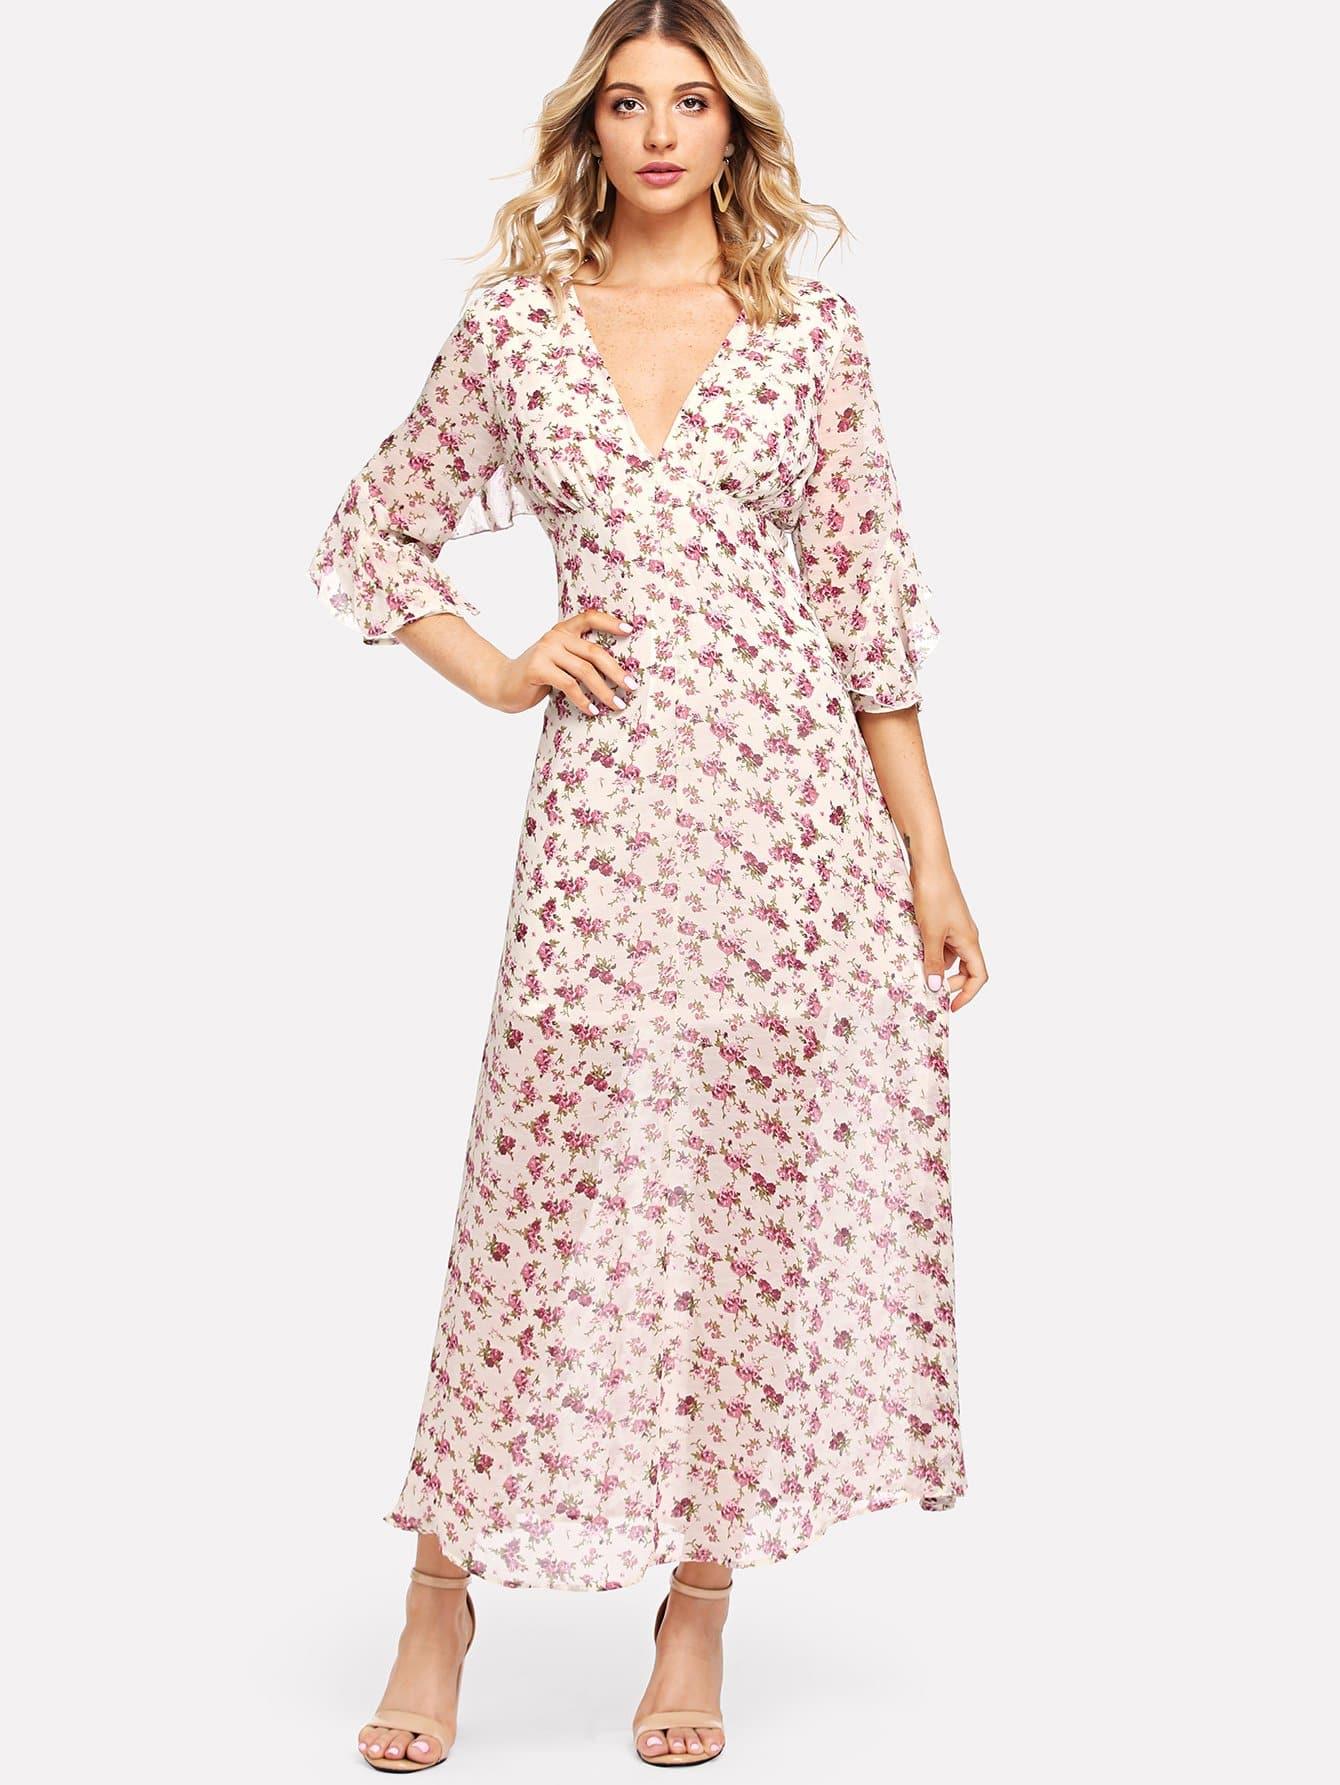 Calico Print Flowy Dress calico print tights